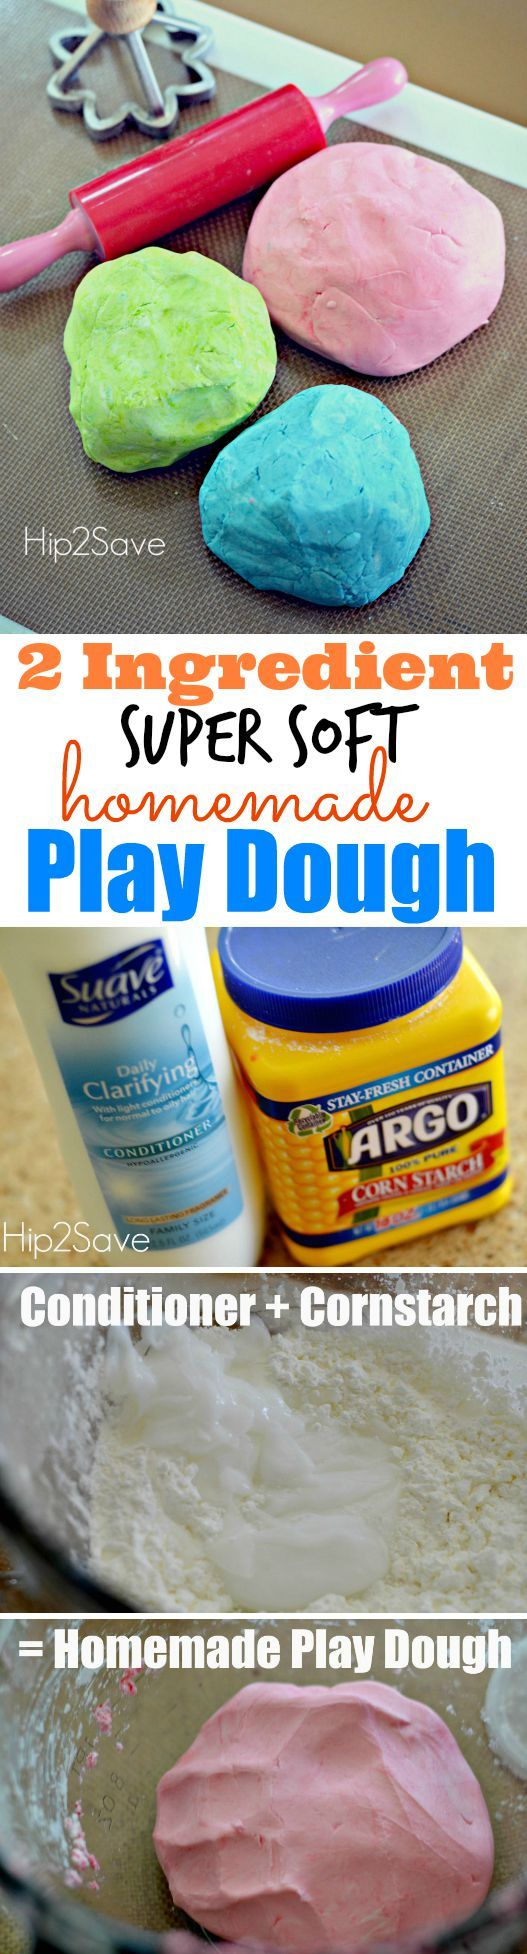 Homemade 2 Ingredient Play Dough – Hip2Save